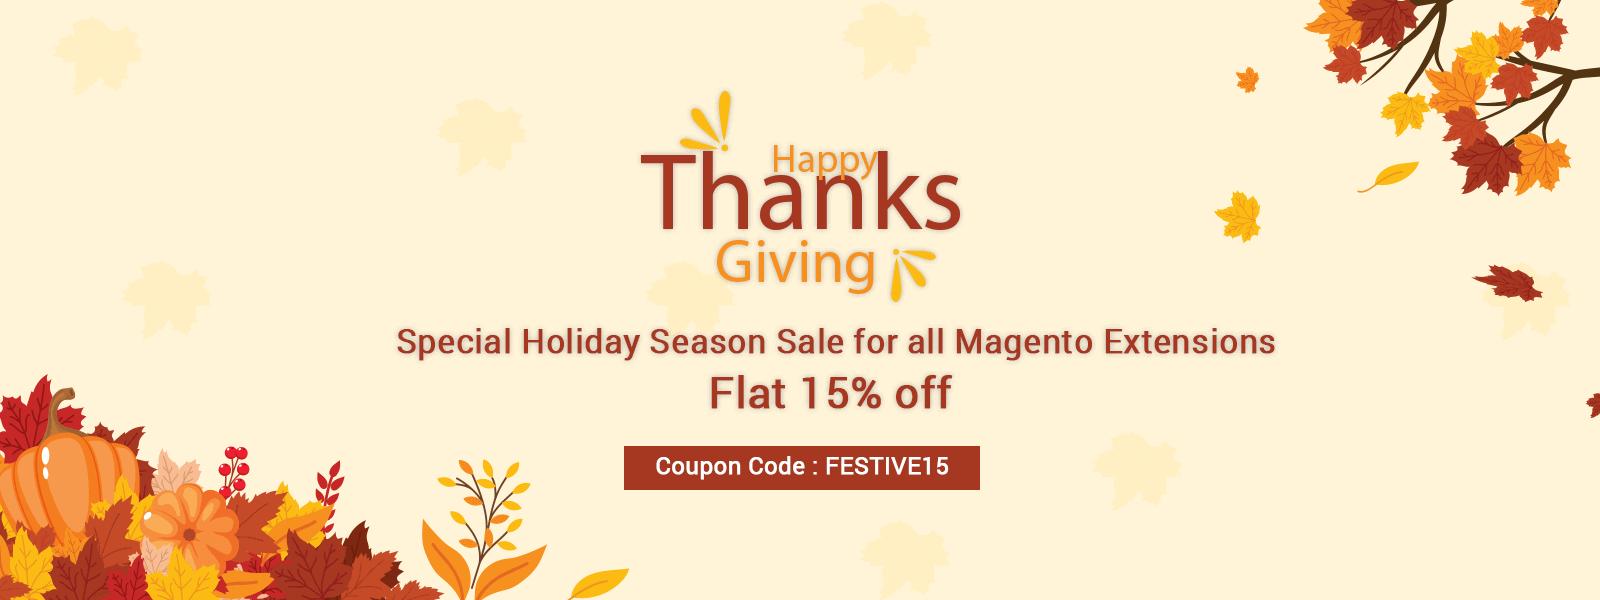 magento thanksgiving festive15